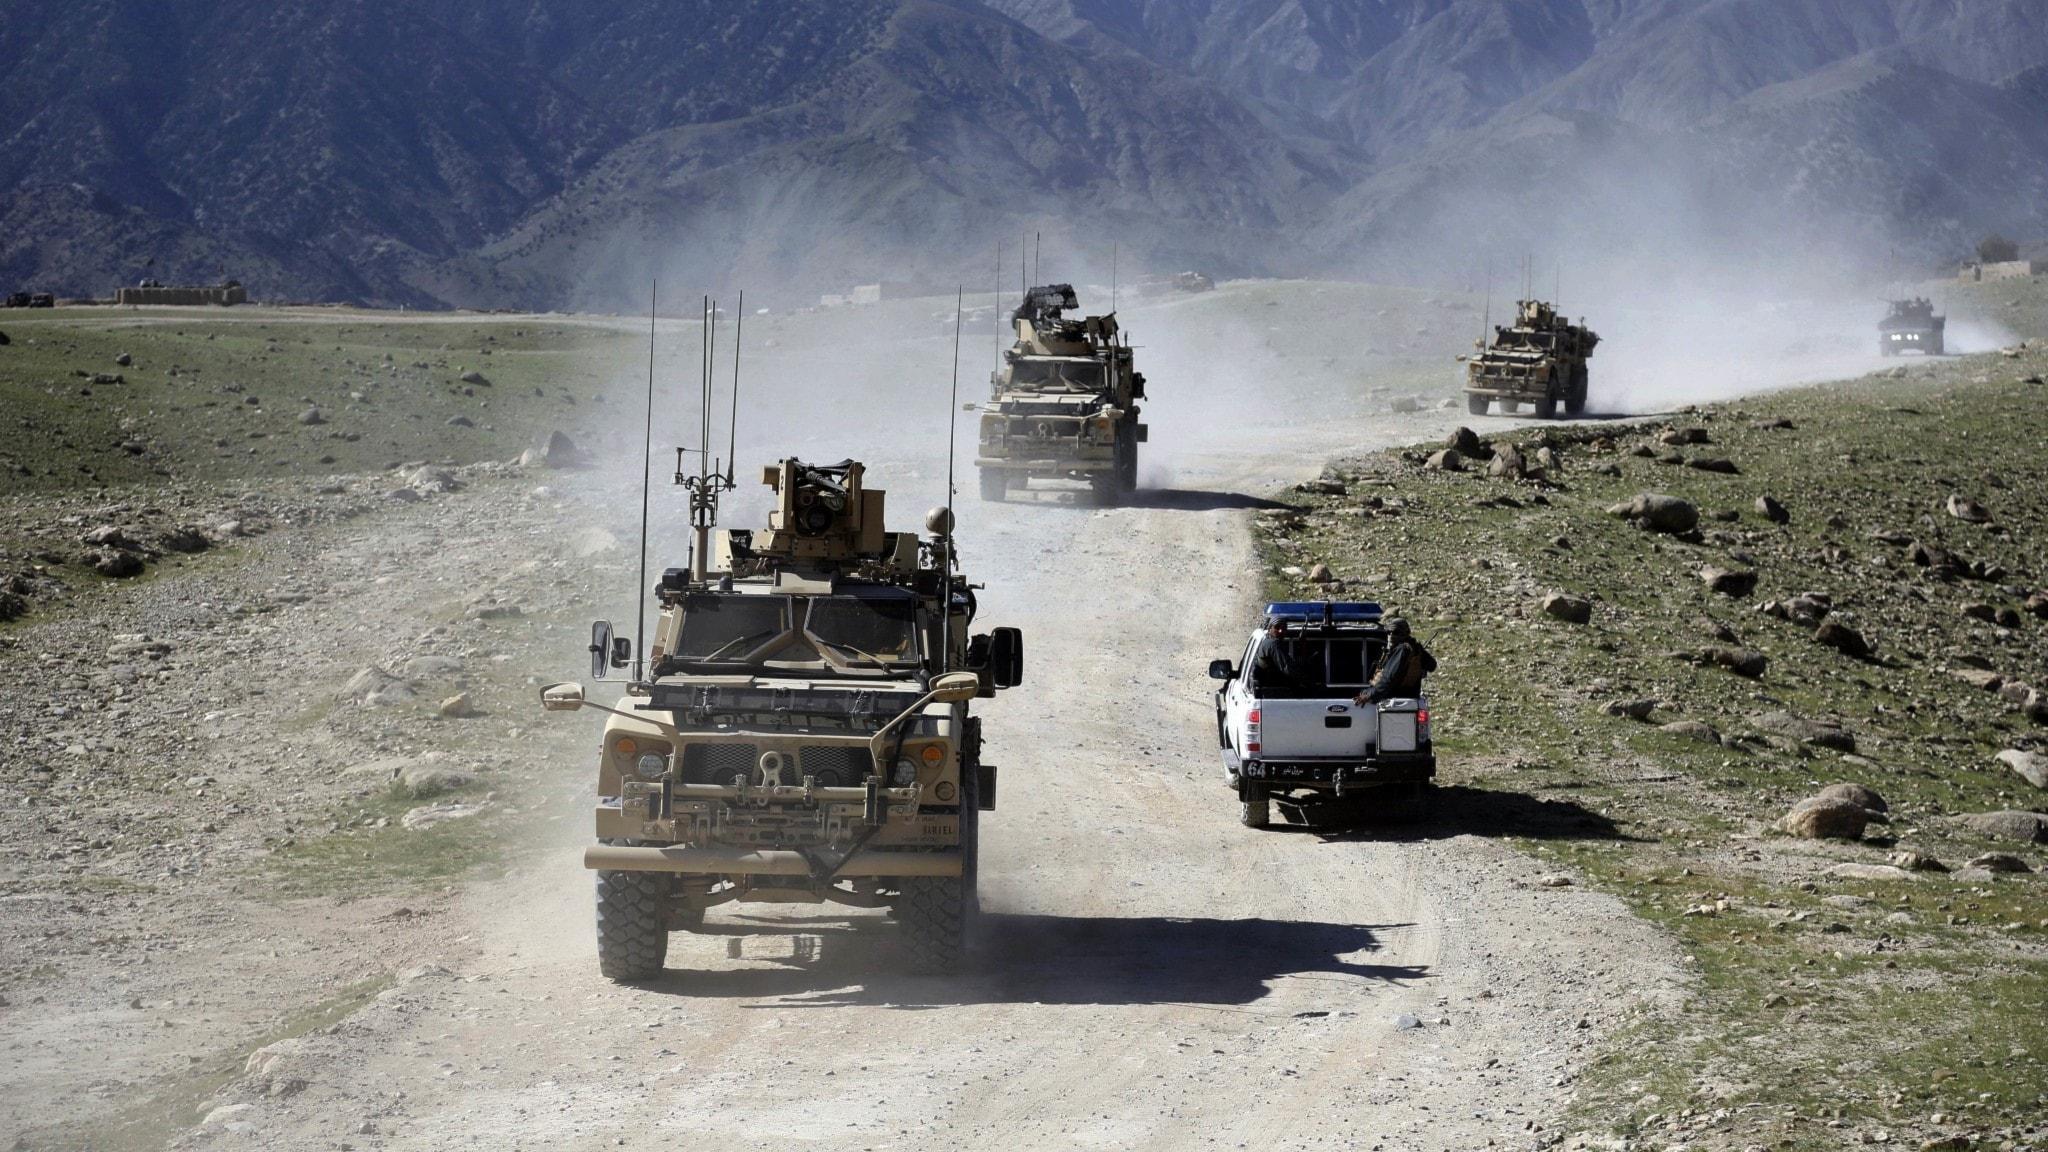 USA:s trupper i Afghanistan